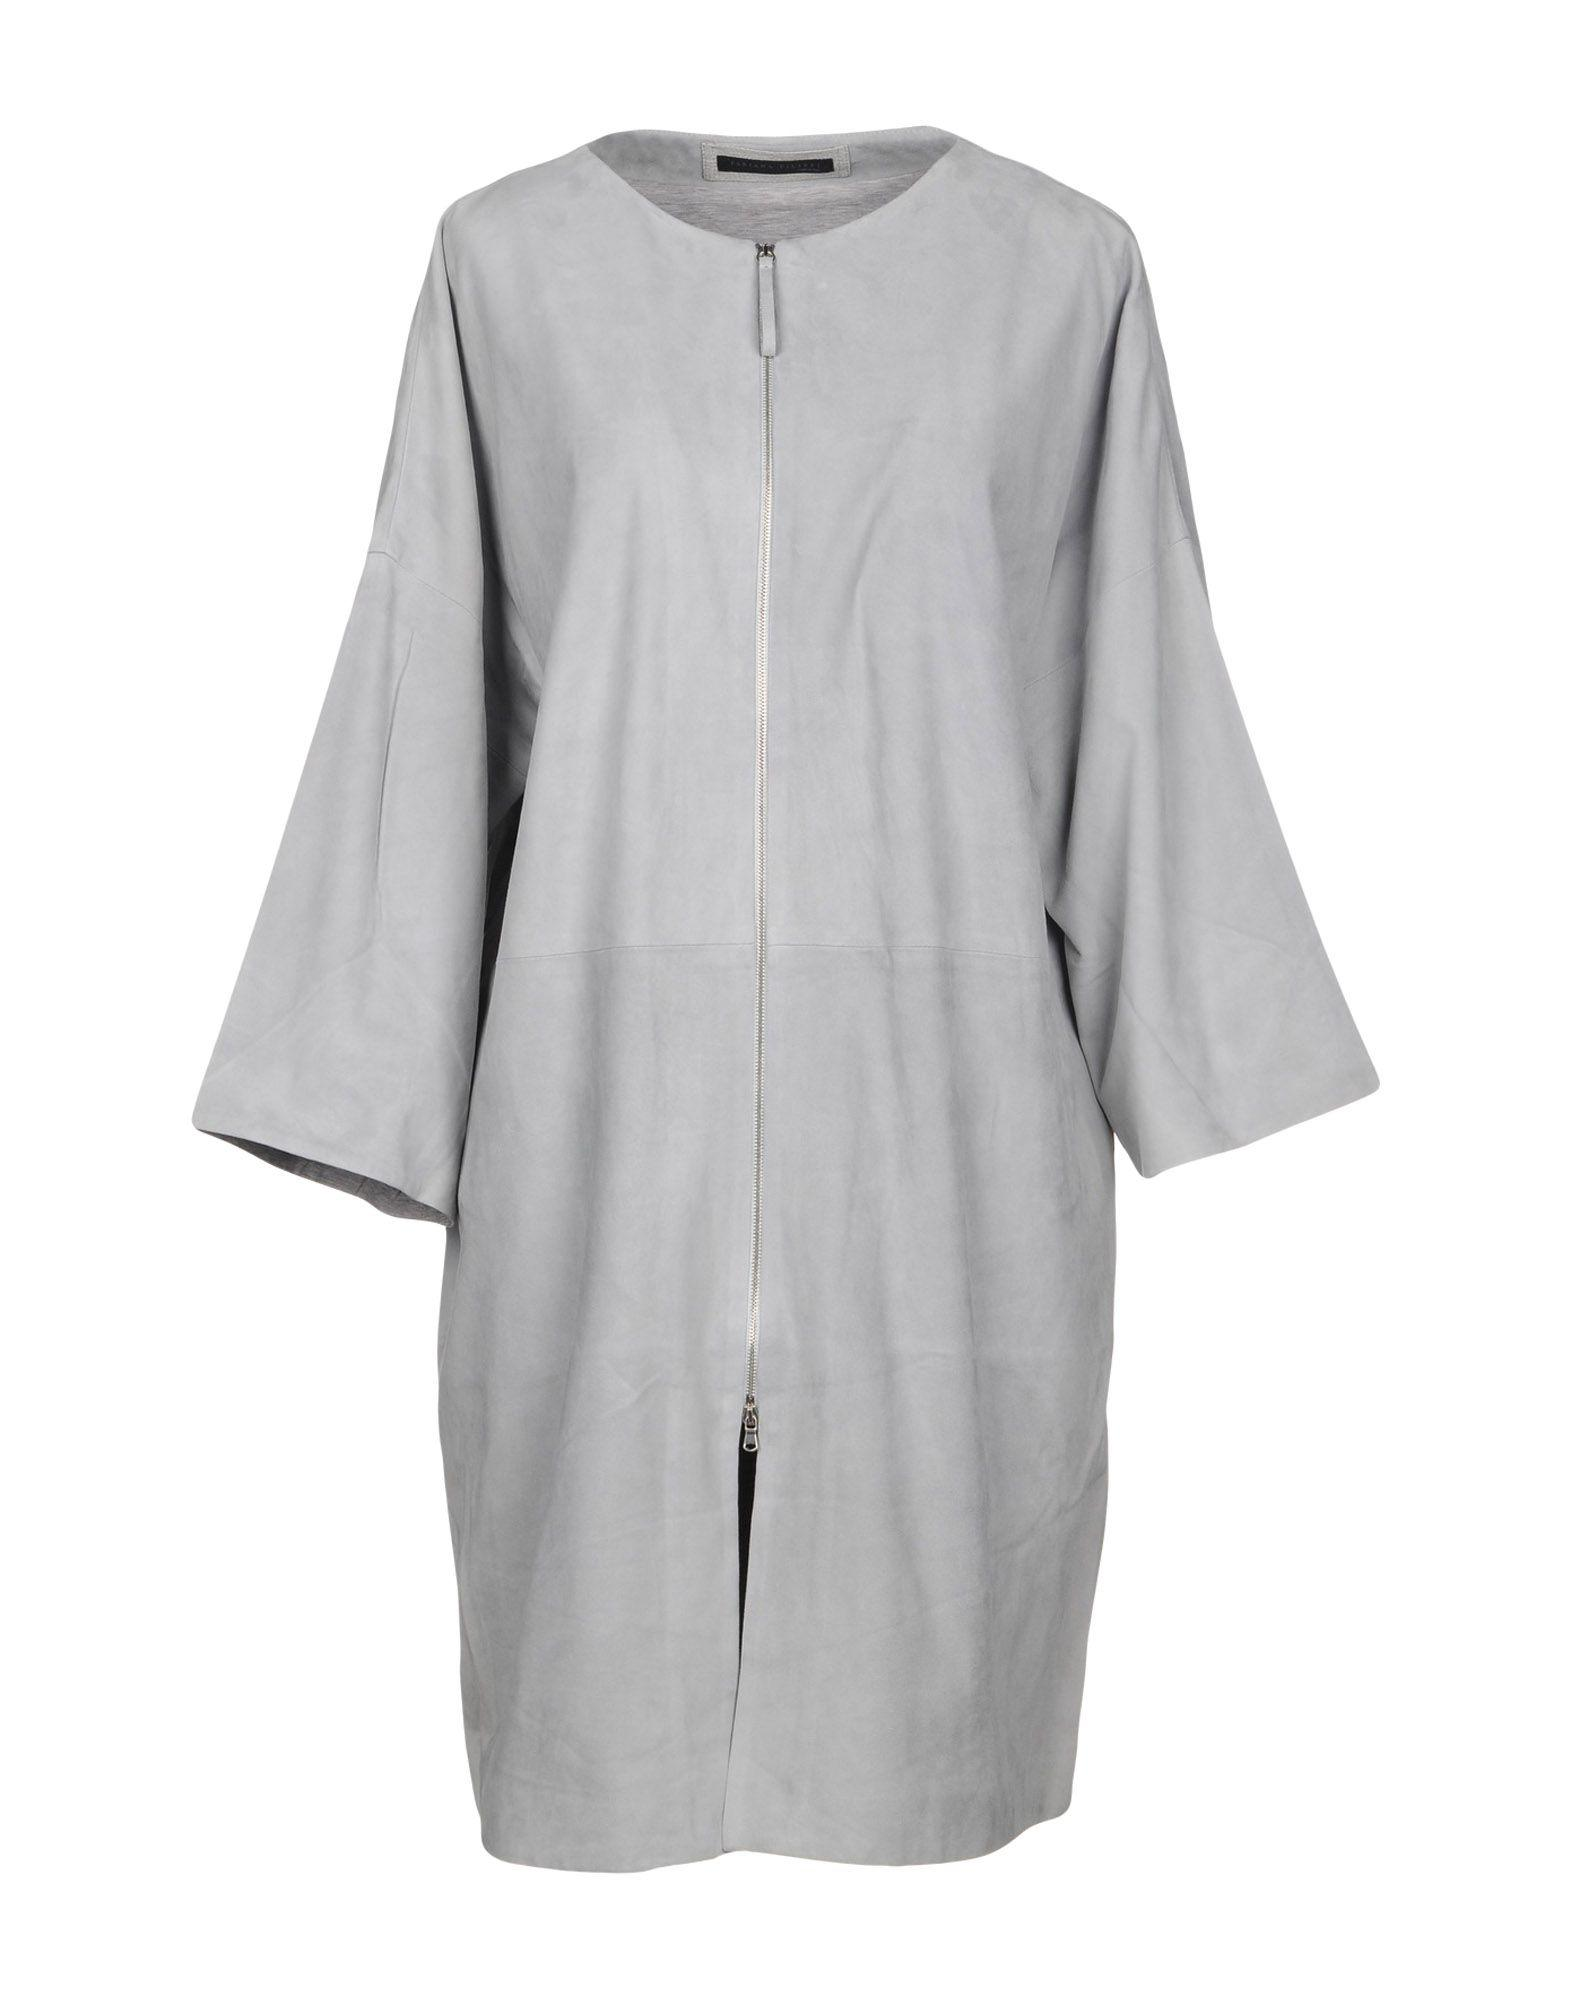 Fabiana Filippi Full-length Jacket In Light Grey